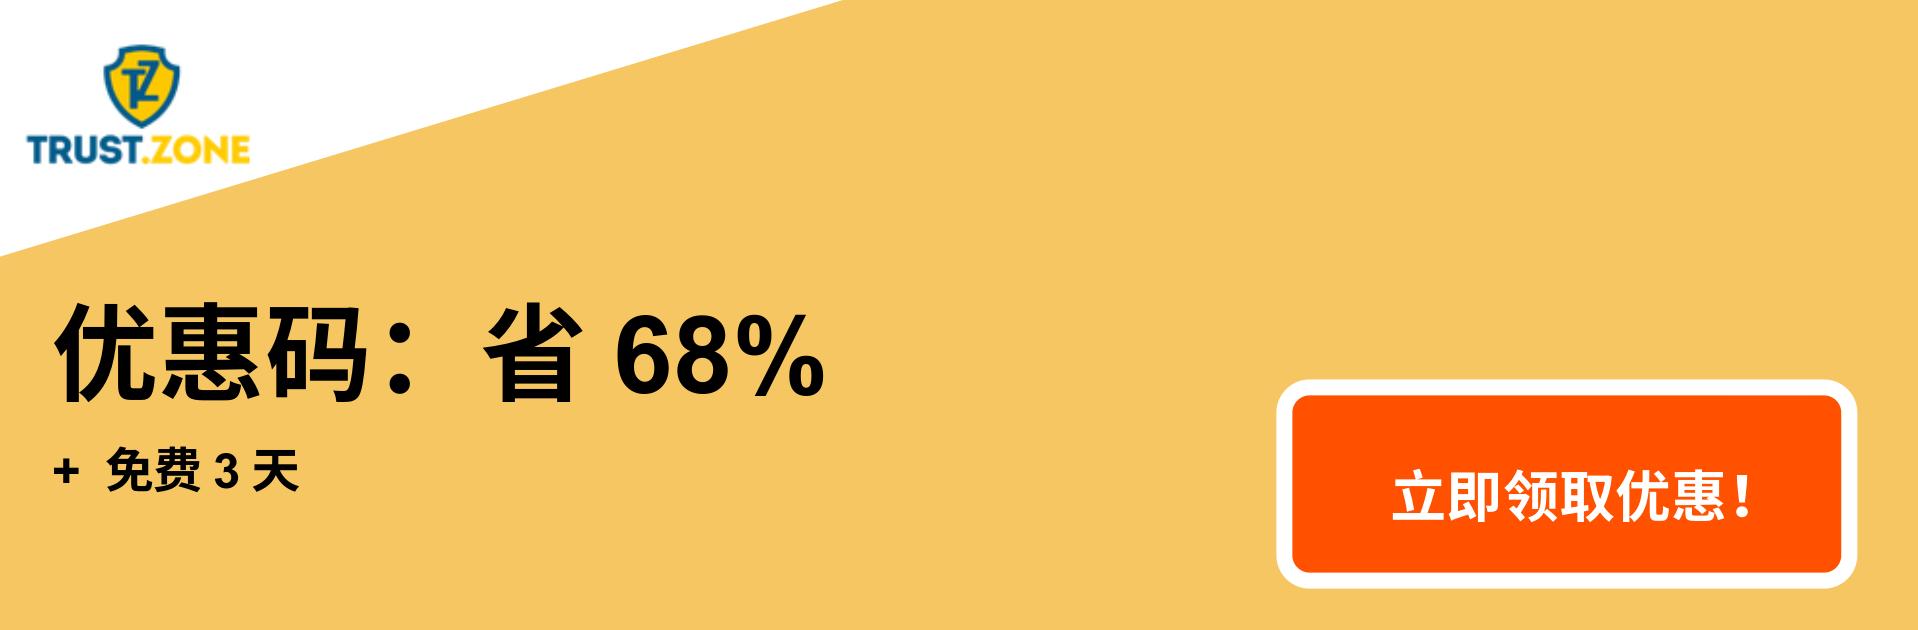 trust zone vpn coupon banner 68% off